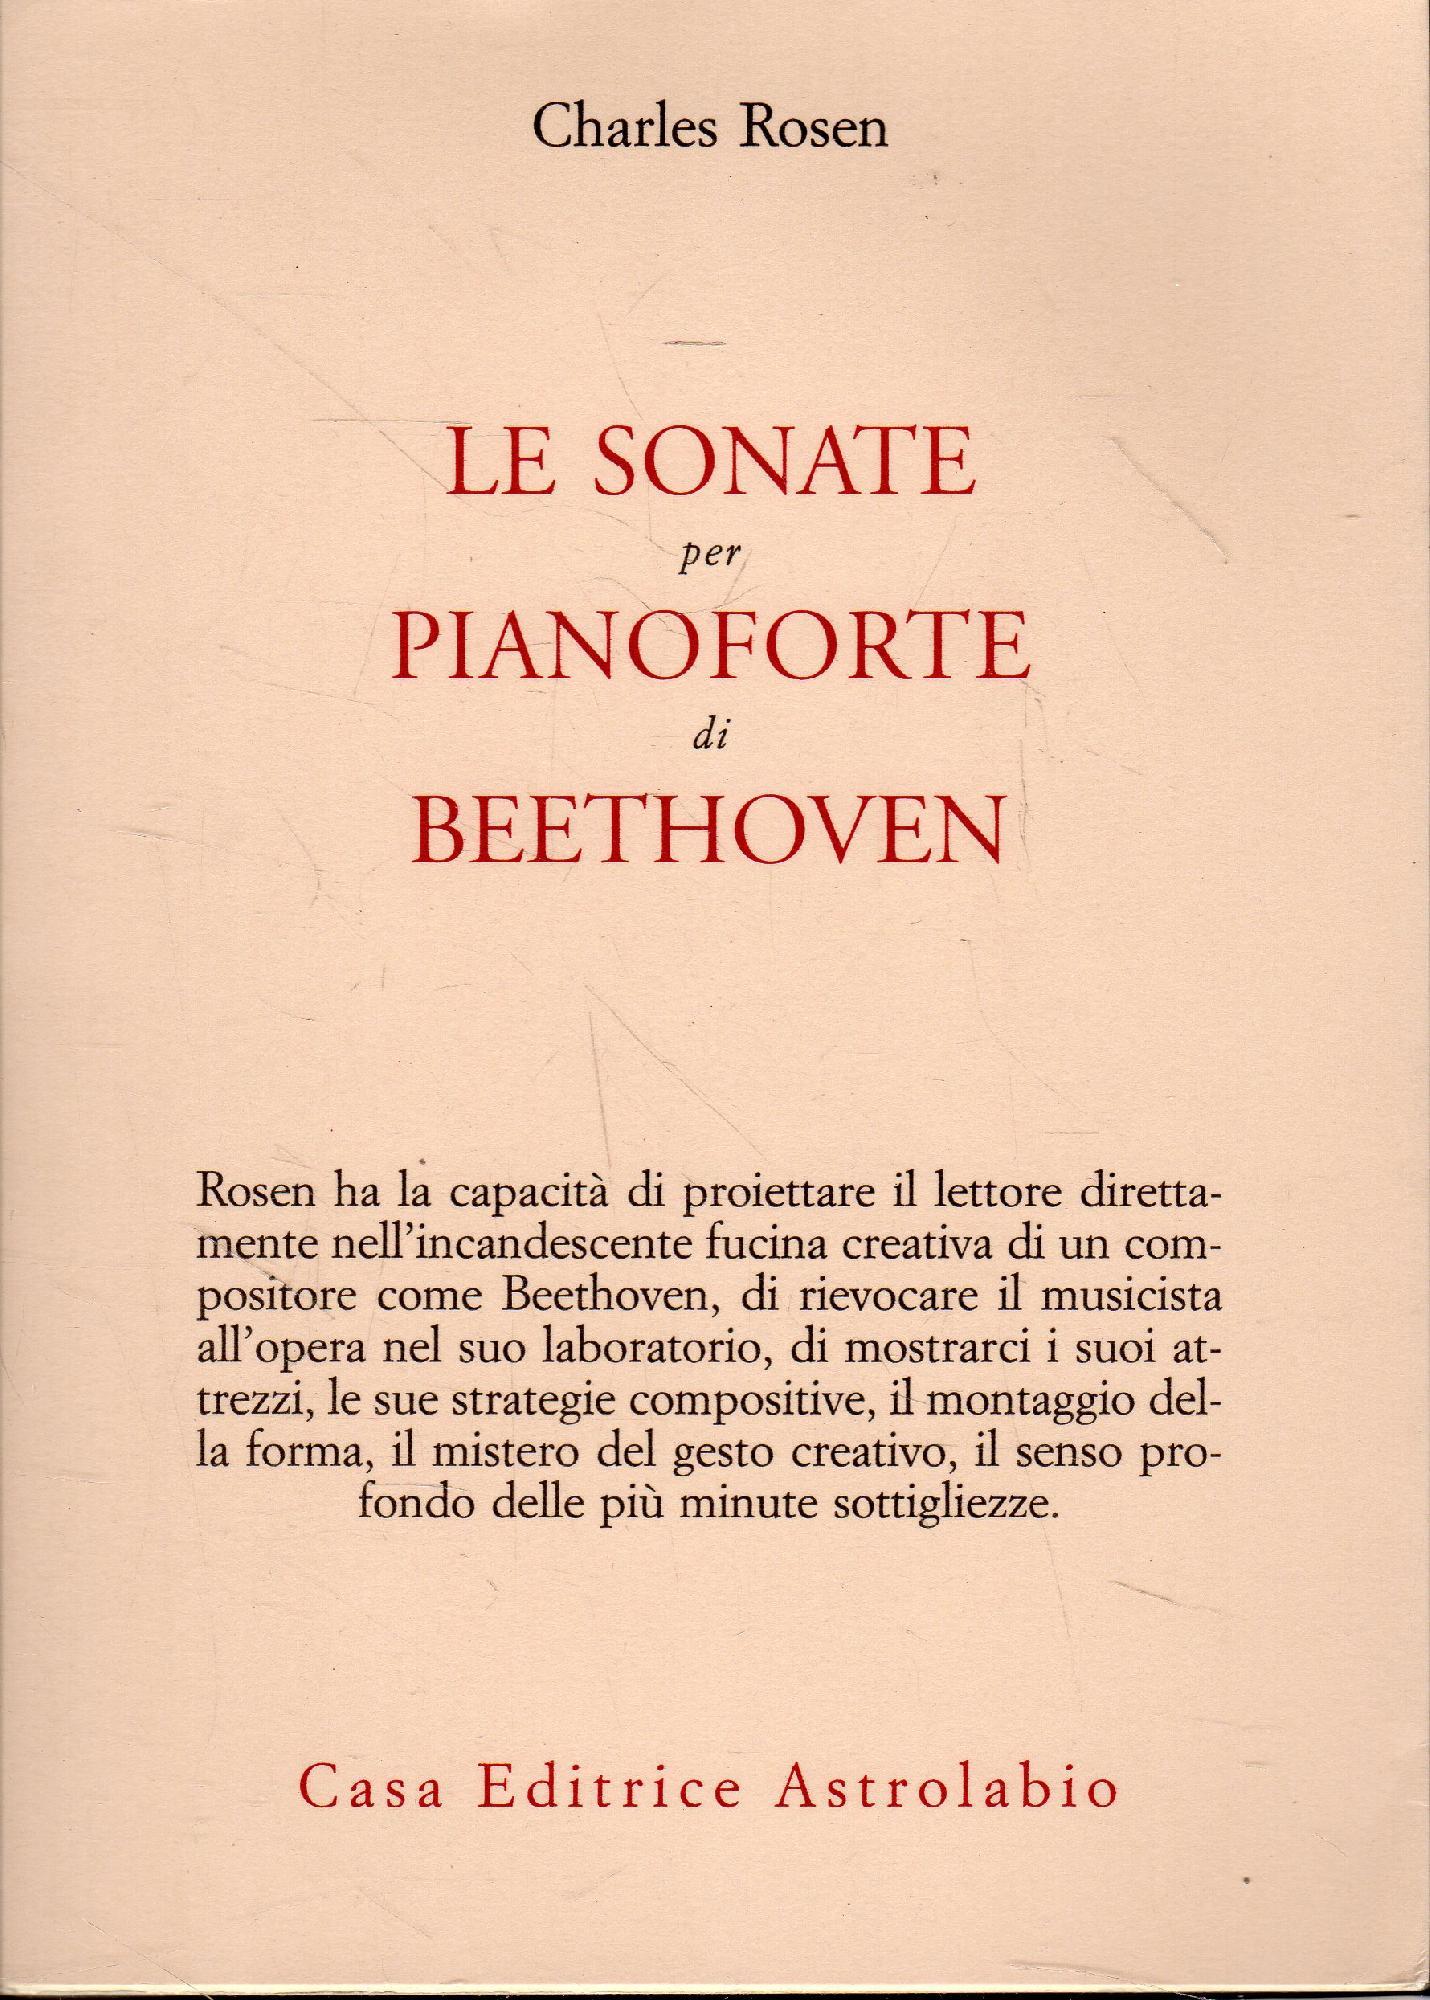 Le sonate per pianoforte di Beethoven - Rosen, Charles